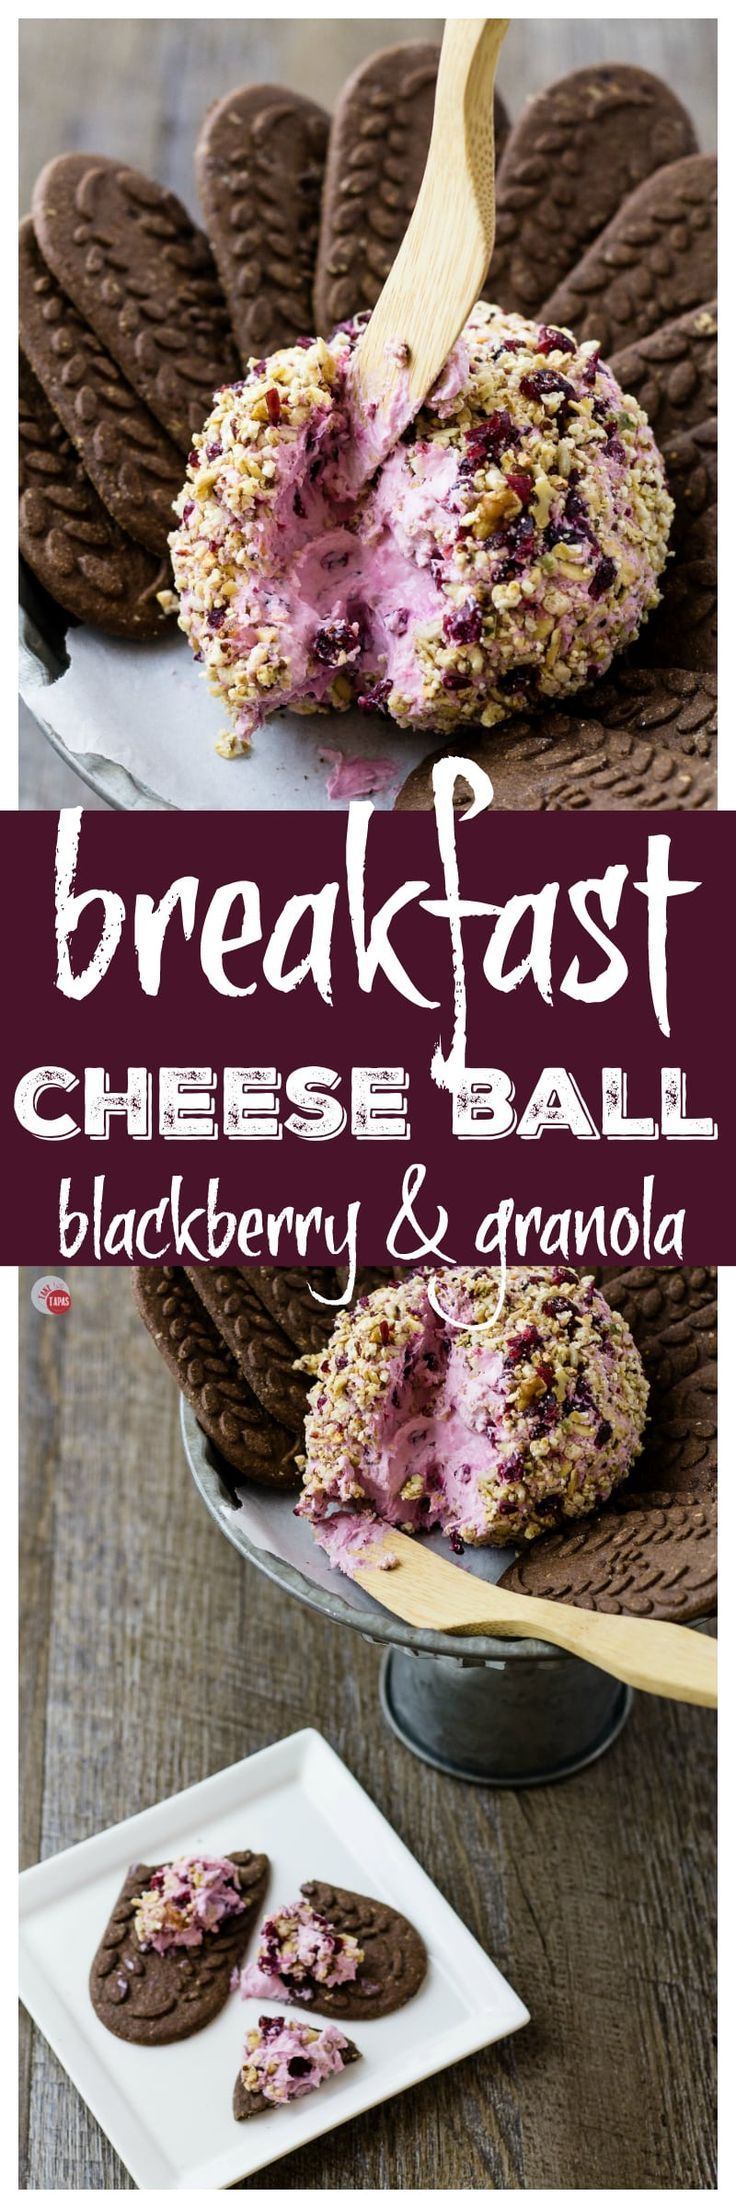 Breakfast Cheese Ball | Take Two Tapas | #Breakfast #Blackberry #Granola #CheeseBall #Brunch